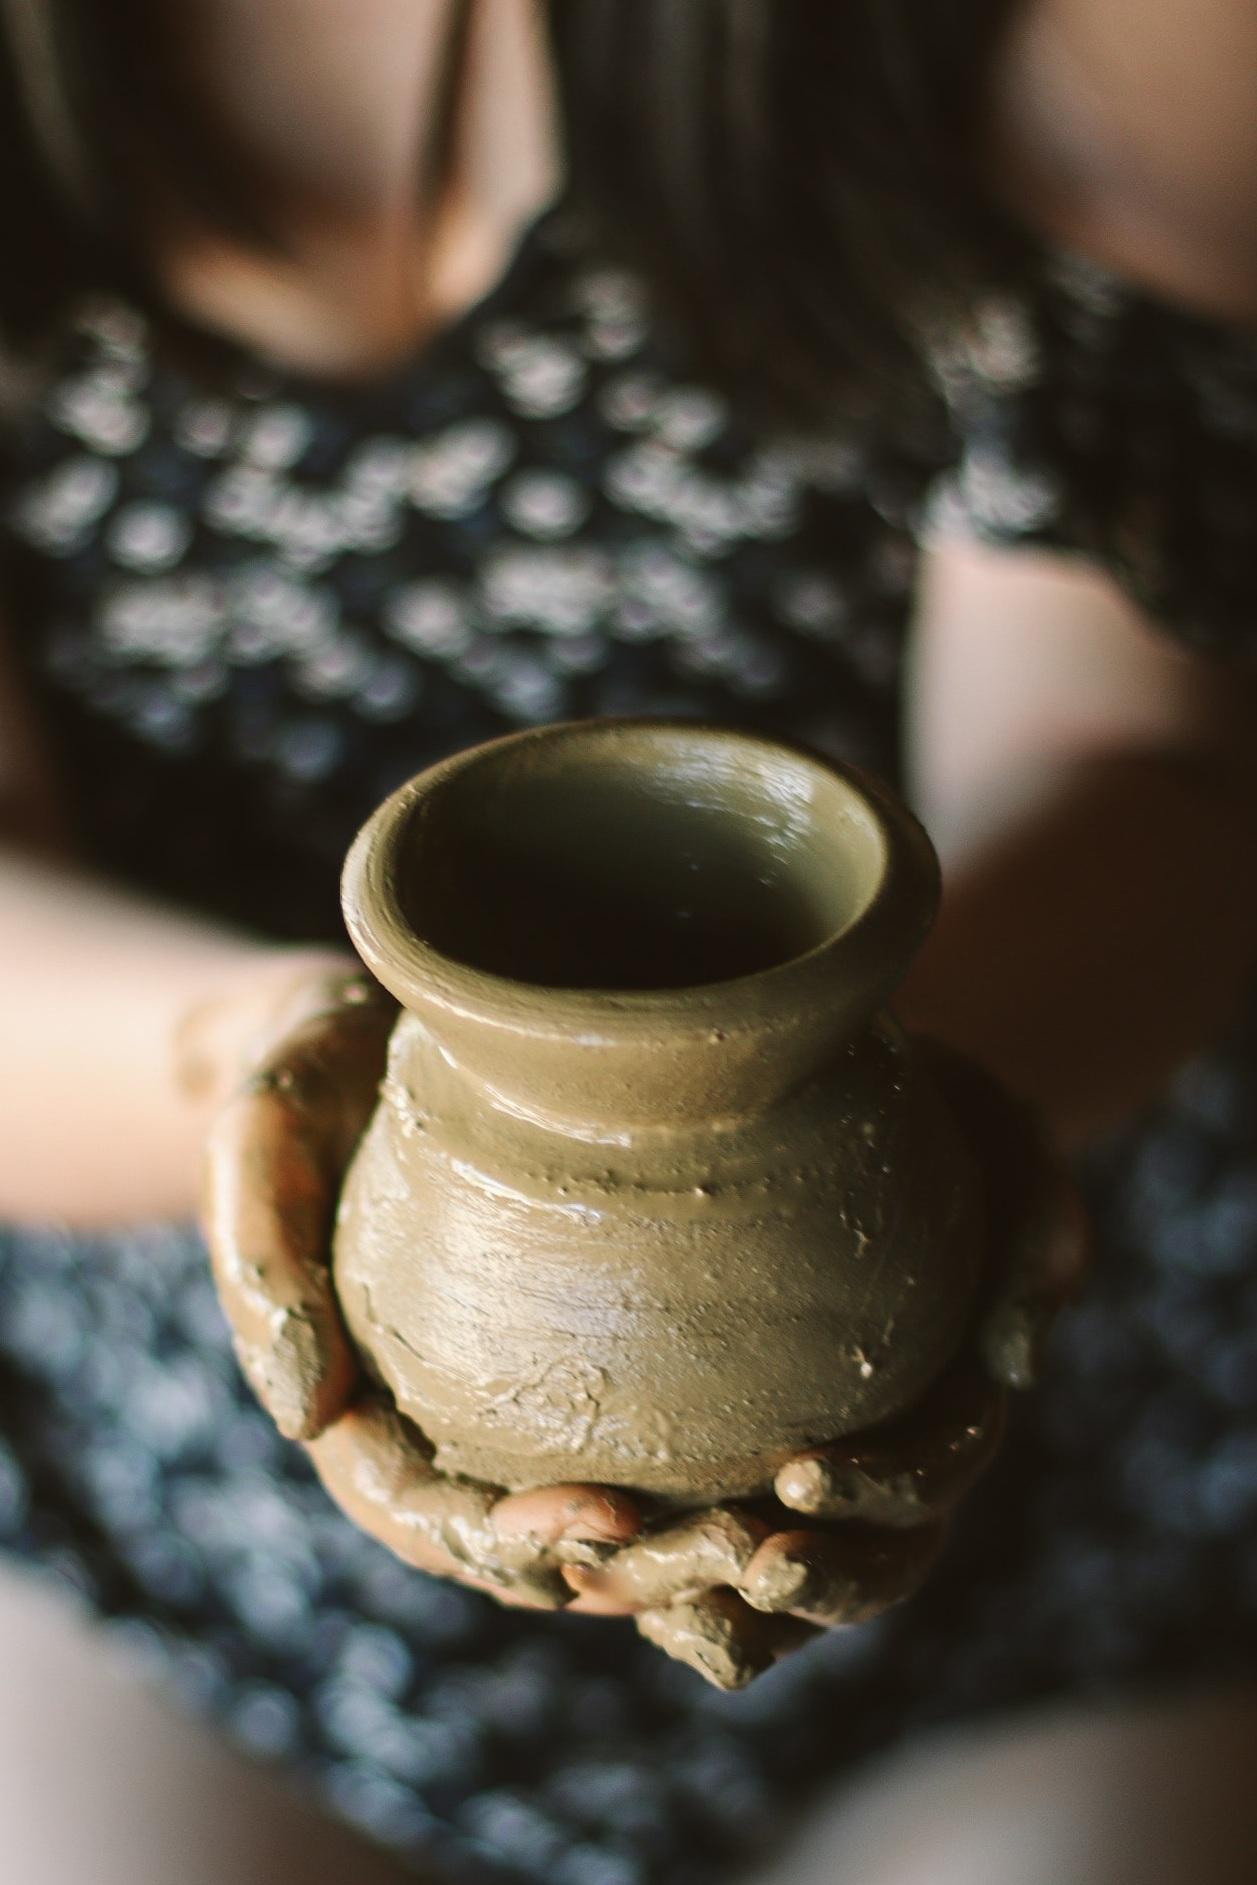 beautiful-blur-clay-1000454.jpg